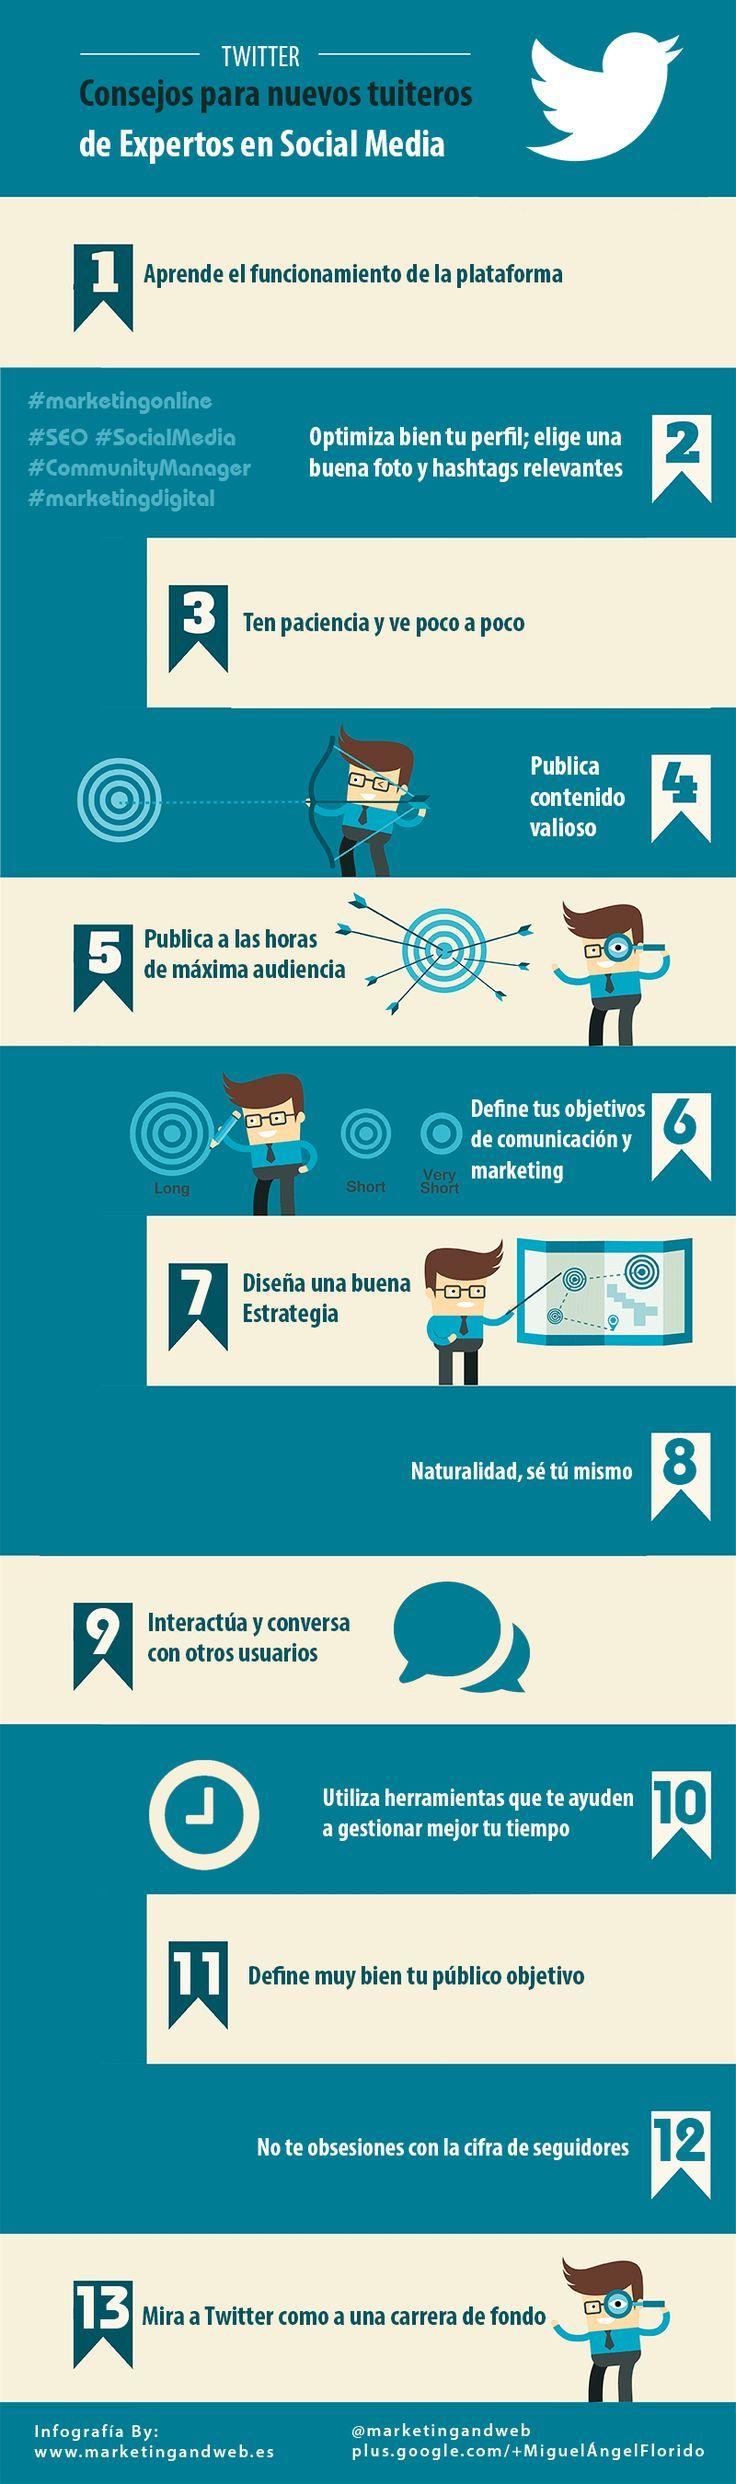 Cómo Conseguir Seguidores En Twitter Truco Efectivo Online Marketing Social Media Social Media Infographic Social Media Community